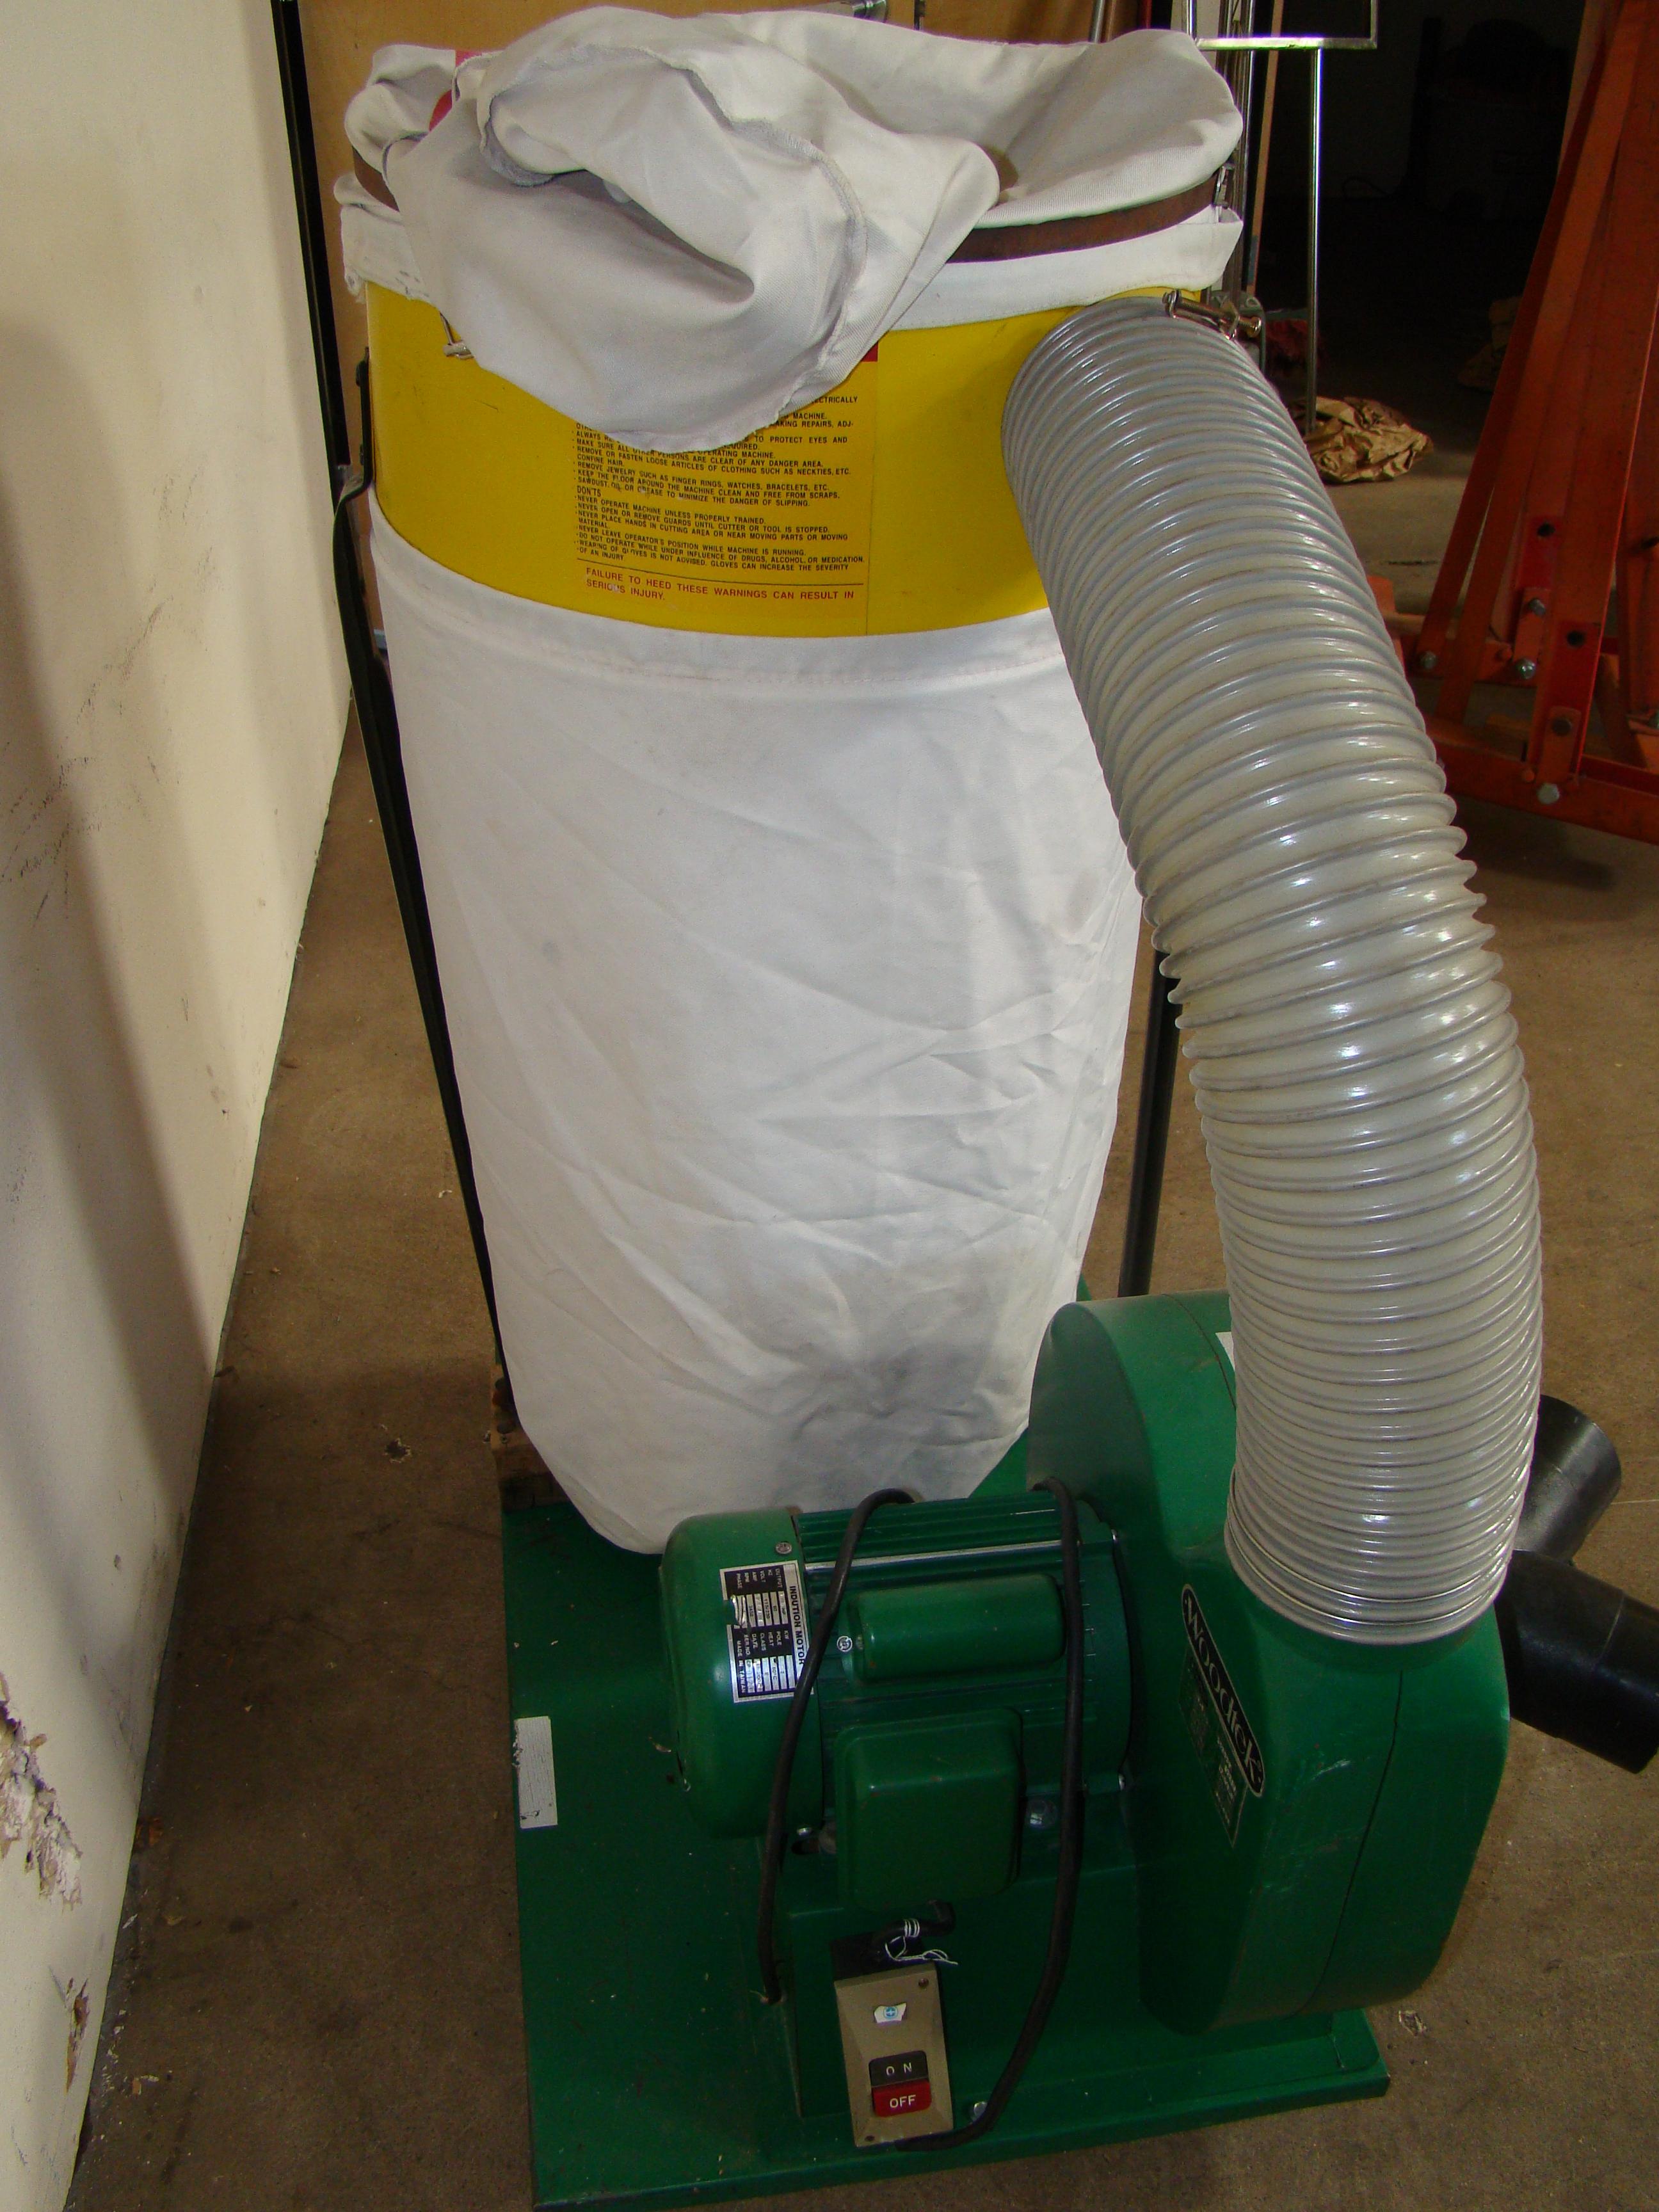 Woodtek Dust Collector 102023 1.5 HP 115/230V 1PH - Image 4 of 6